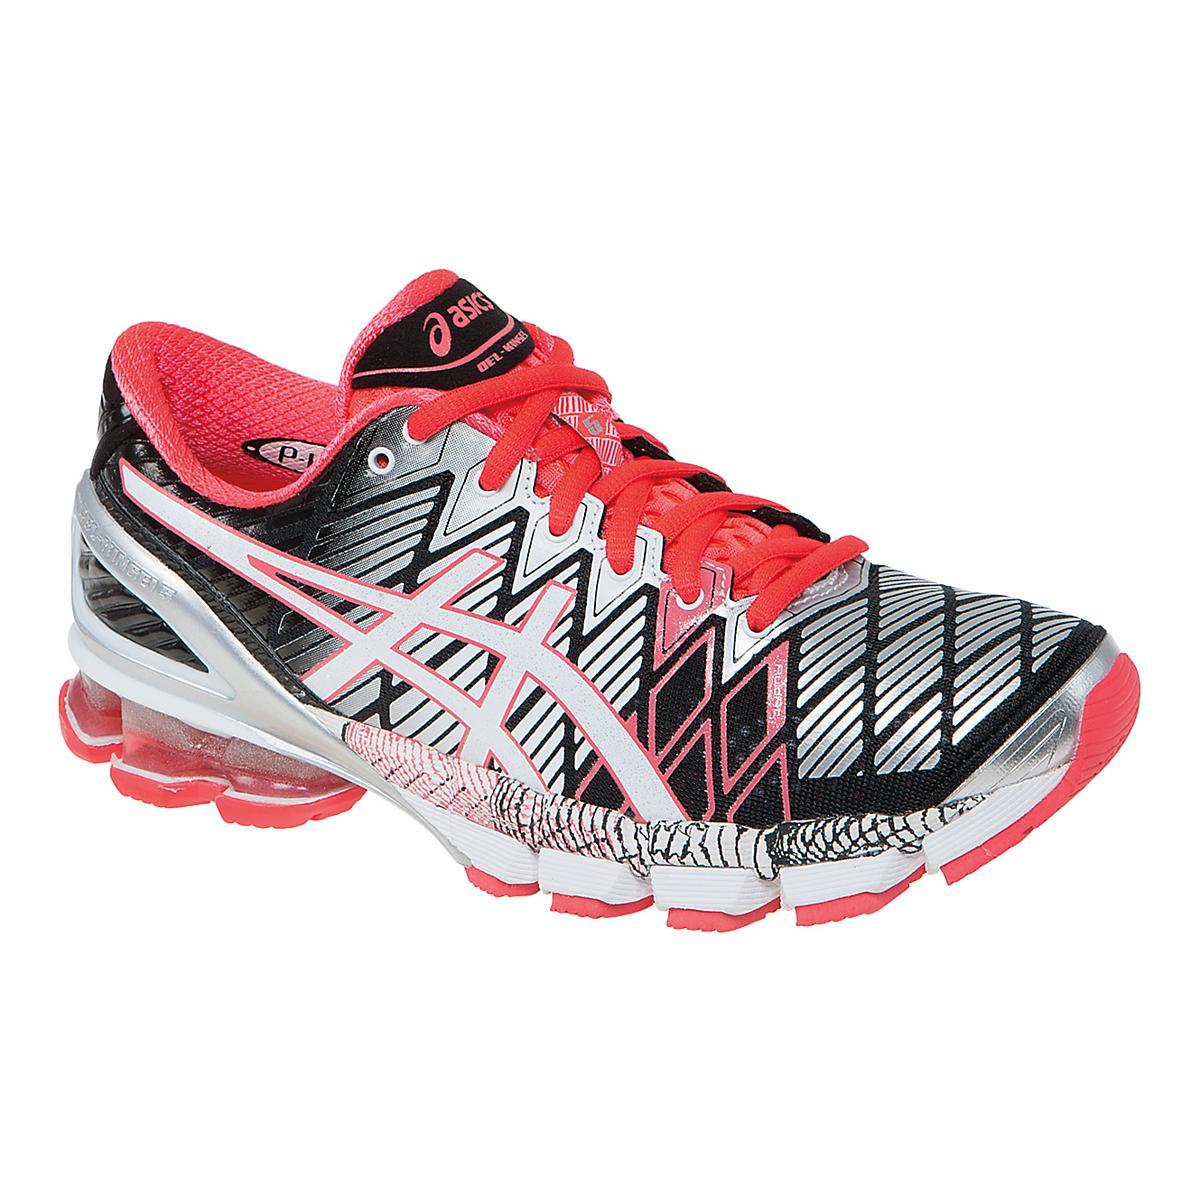 womens asics gel kinsei 5 running shoe at road runner sports. Black Bedroom Furniture Sets. Home Design Ideas